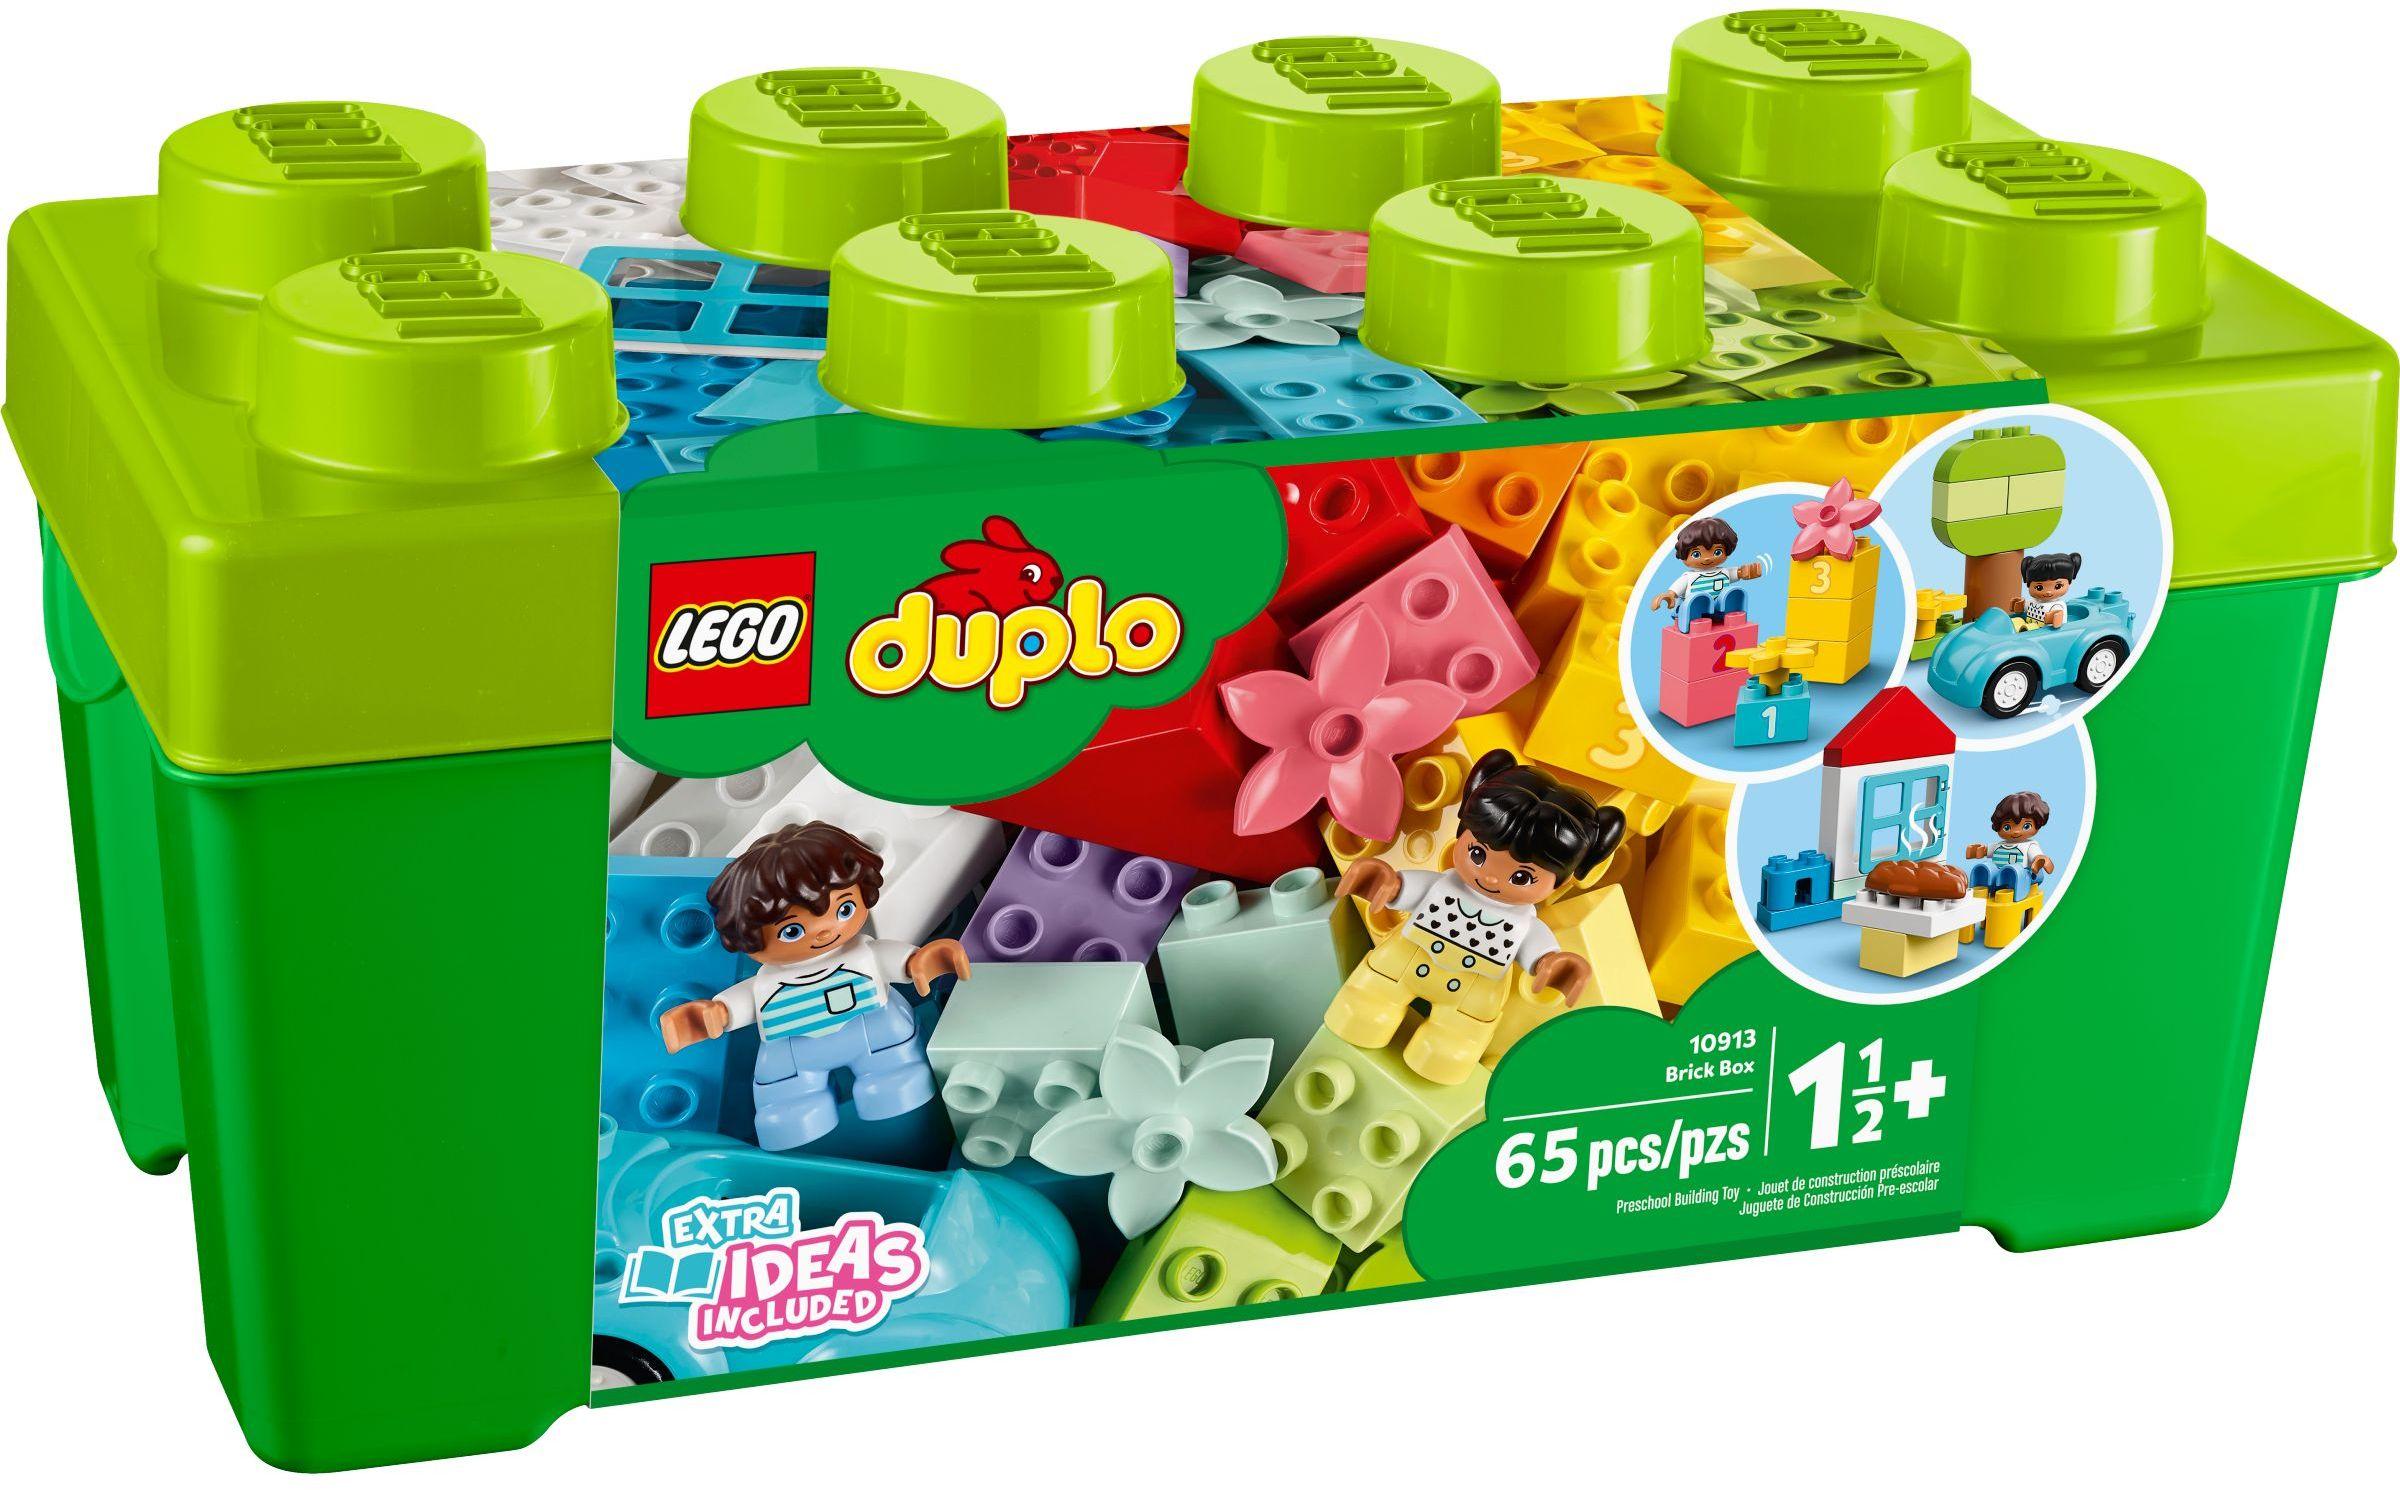 LEGO DUPLO - Brick Box (10913)